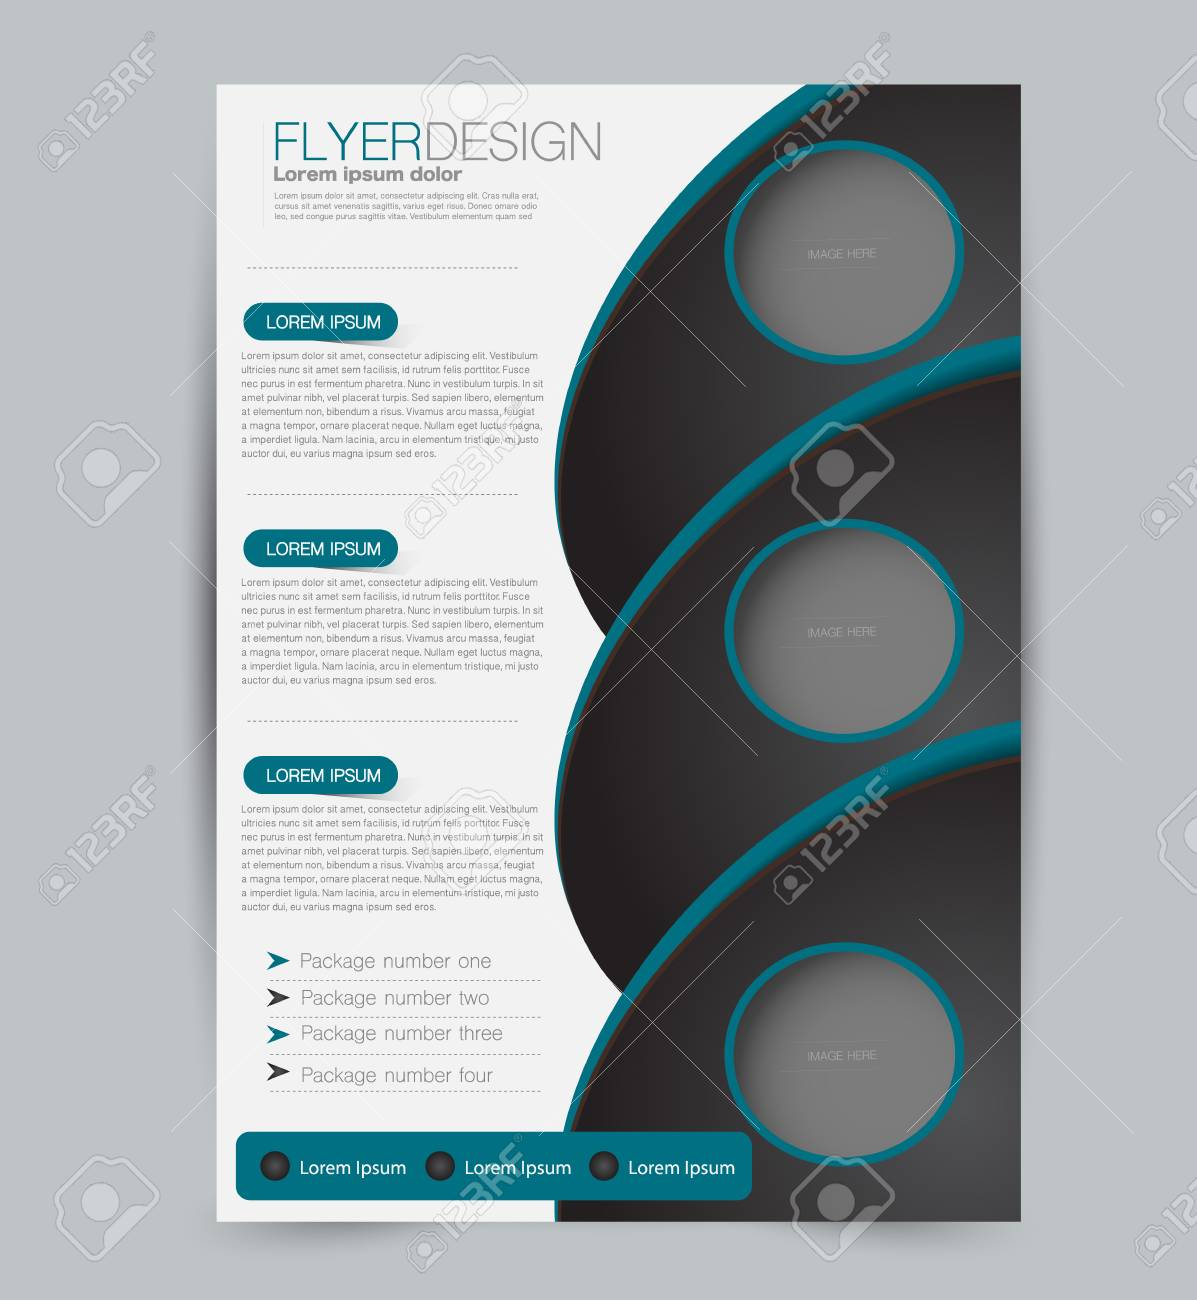 Flyer template. Design for a business, education, advertisement brochure, poster or pamphlet. Vector illustration. Black and blue color. - 126875197